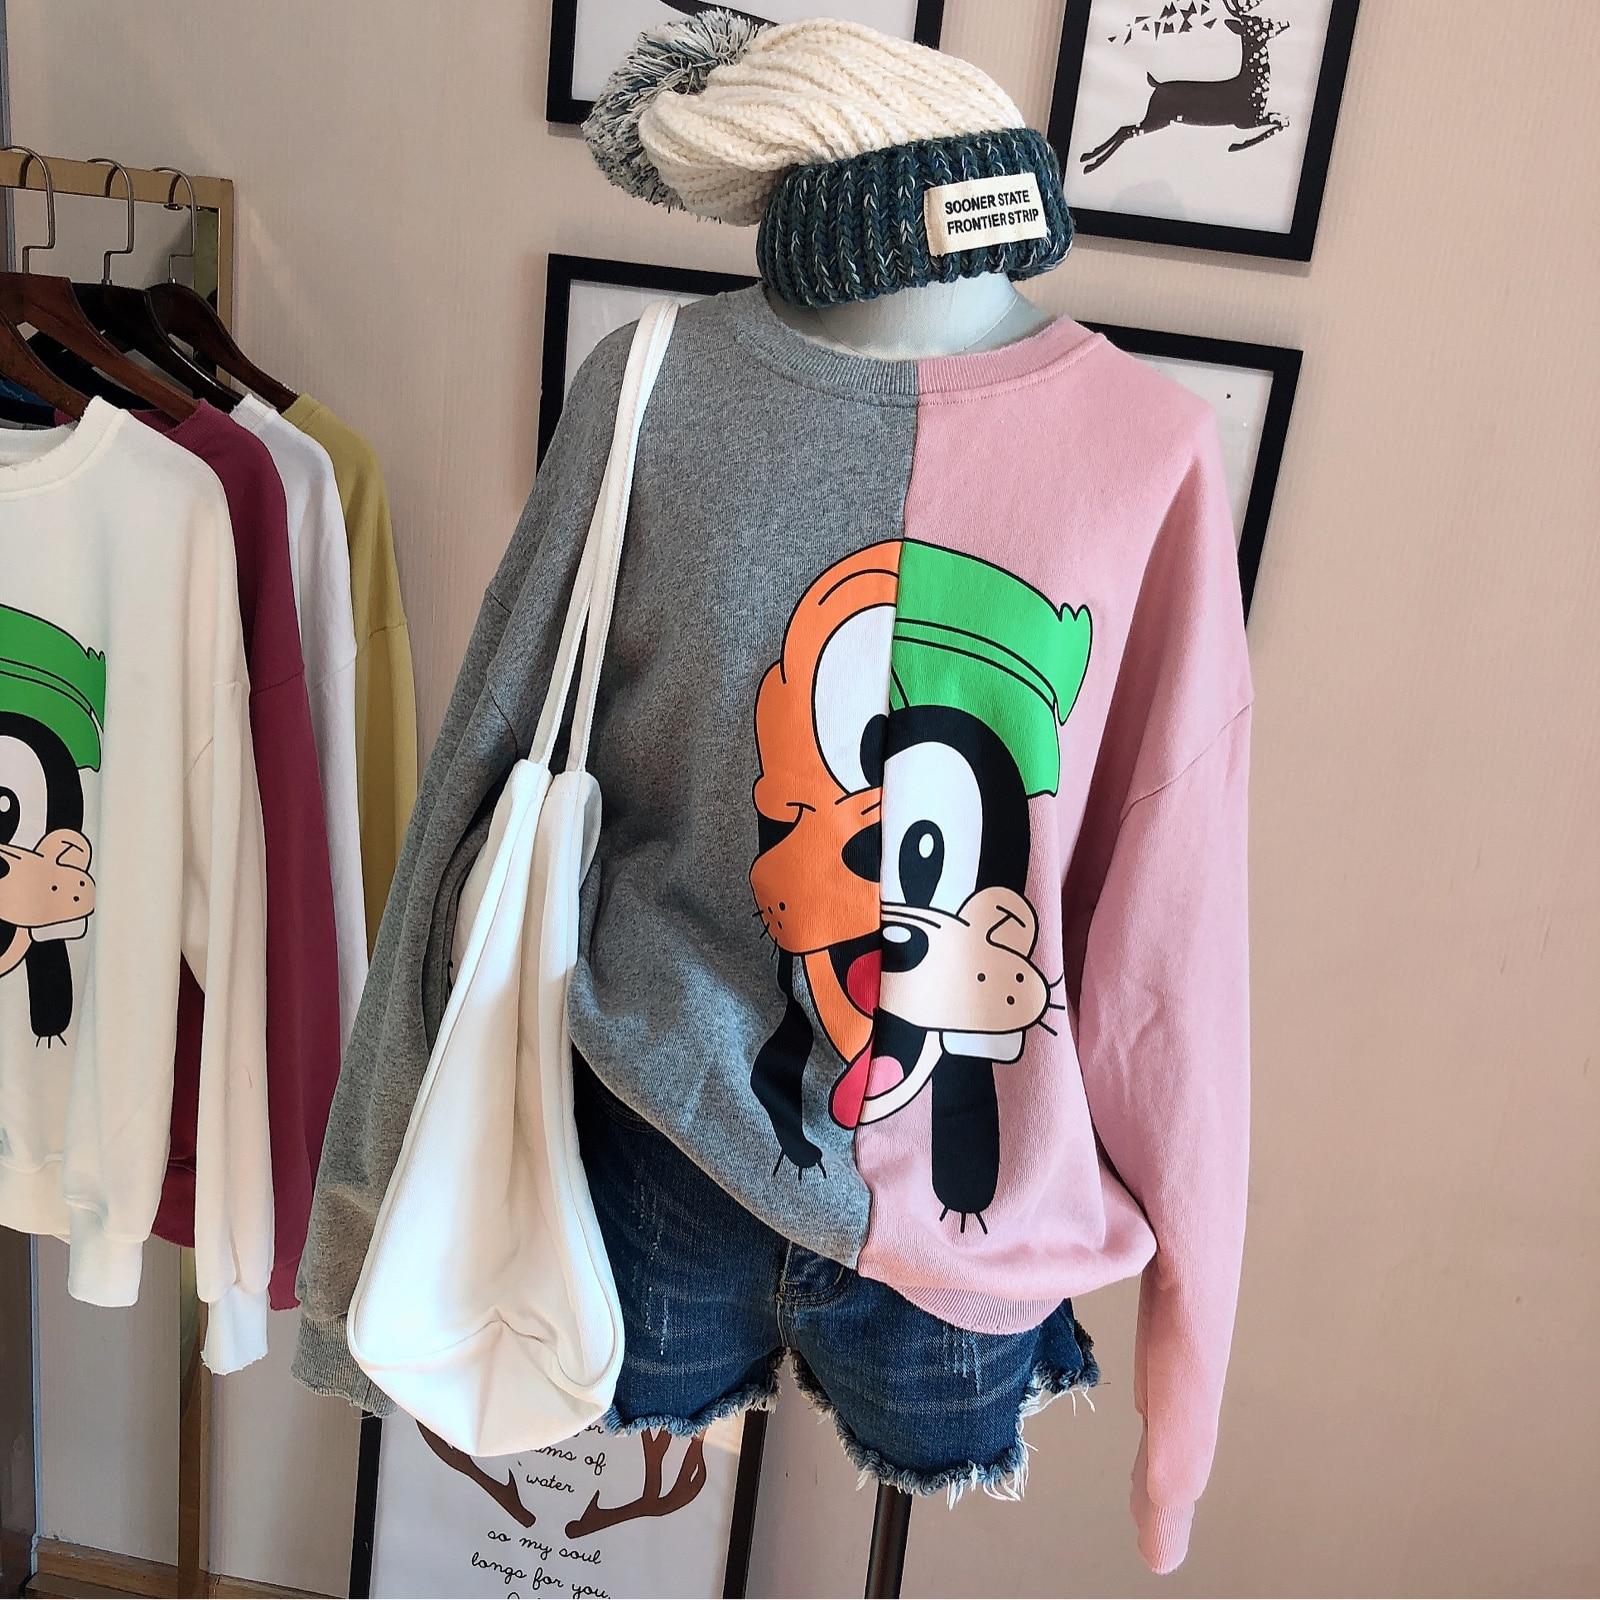 2020 Sweatshirt Women's Spring Autumn Thin New Korean  Fashion Lazy Style Cartoon Women Hoodies Tops